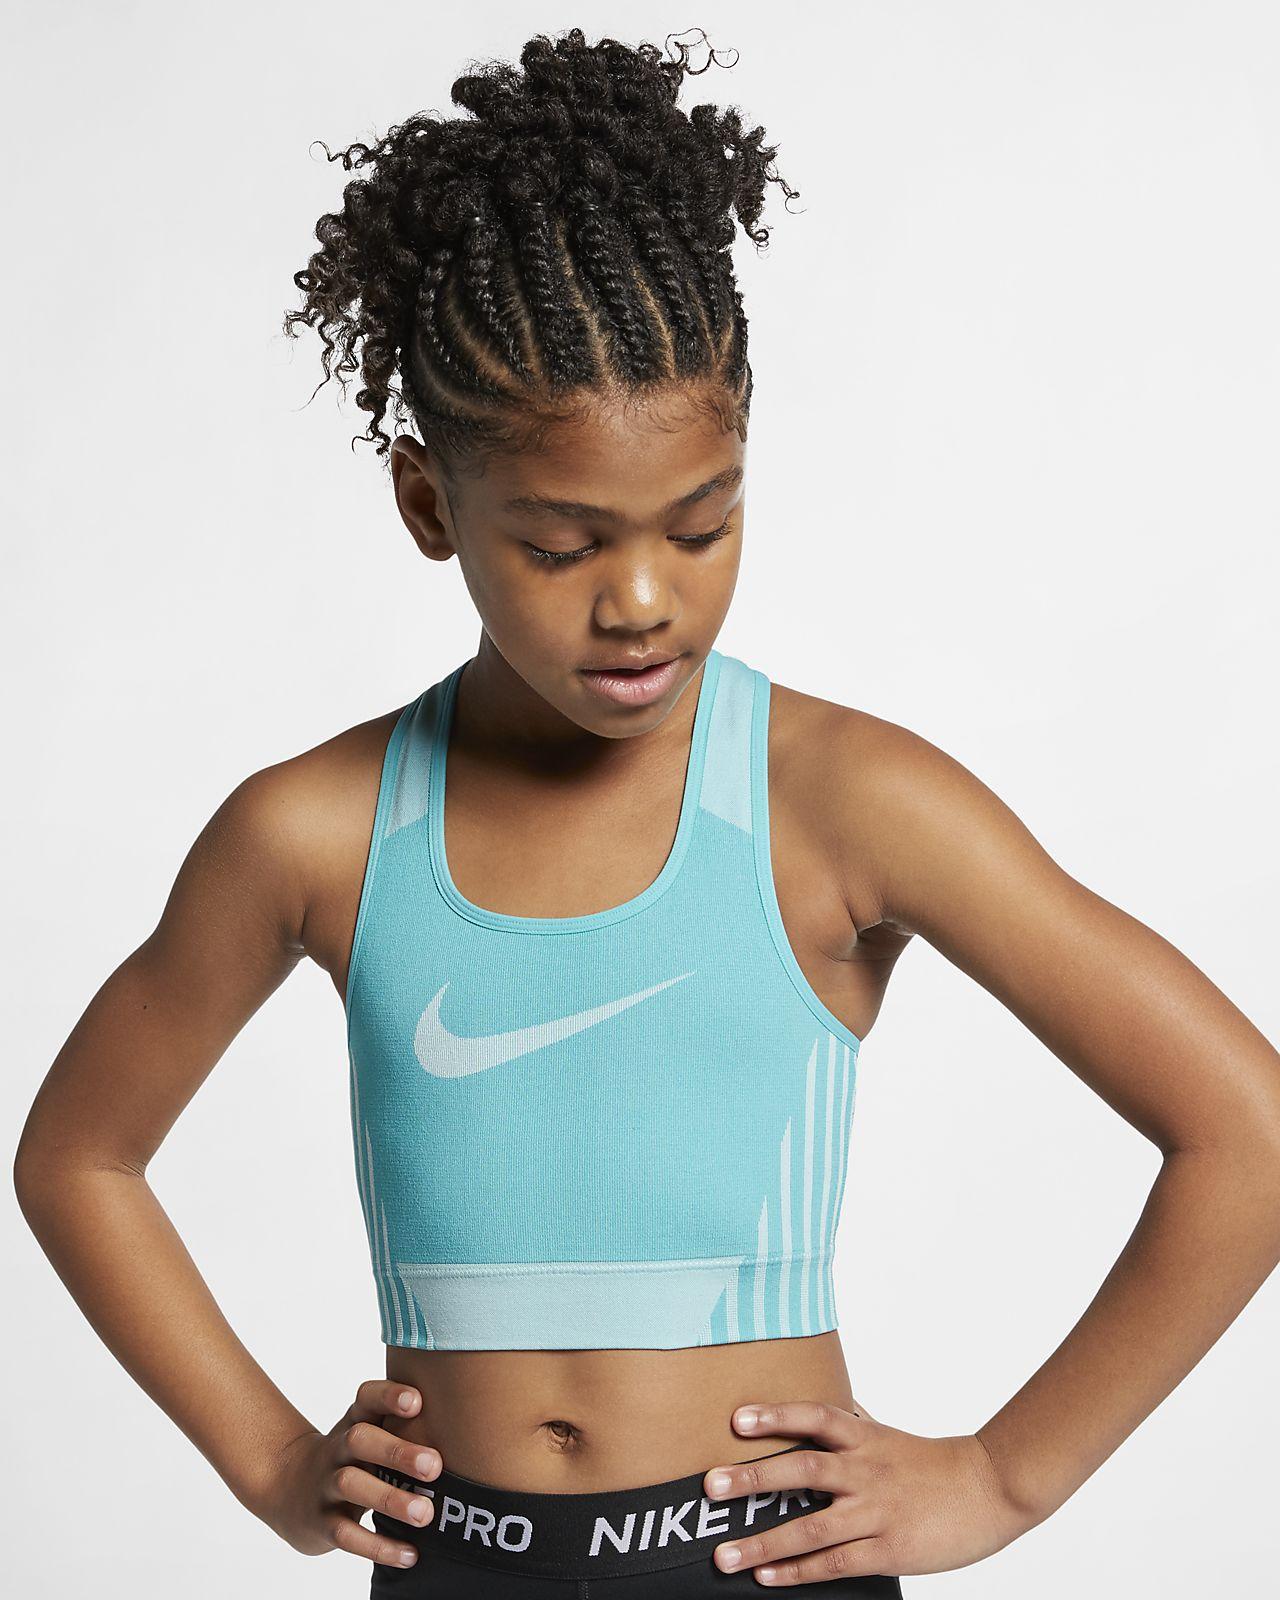 Nike FE/NOM Sculpt BH til jente